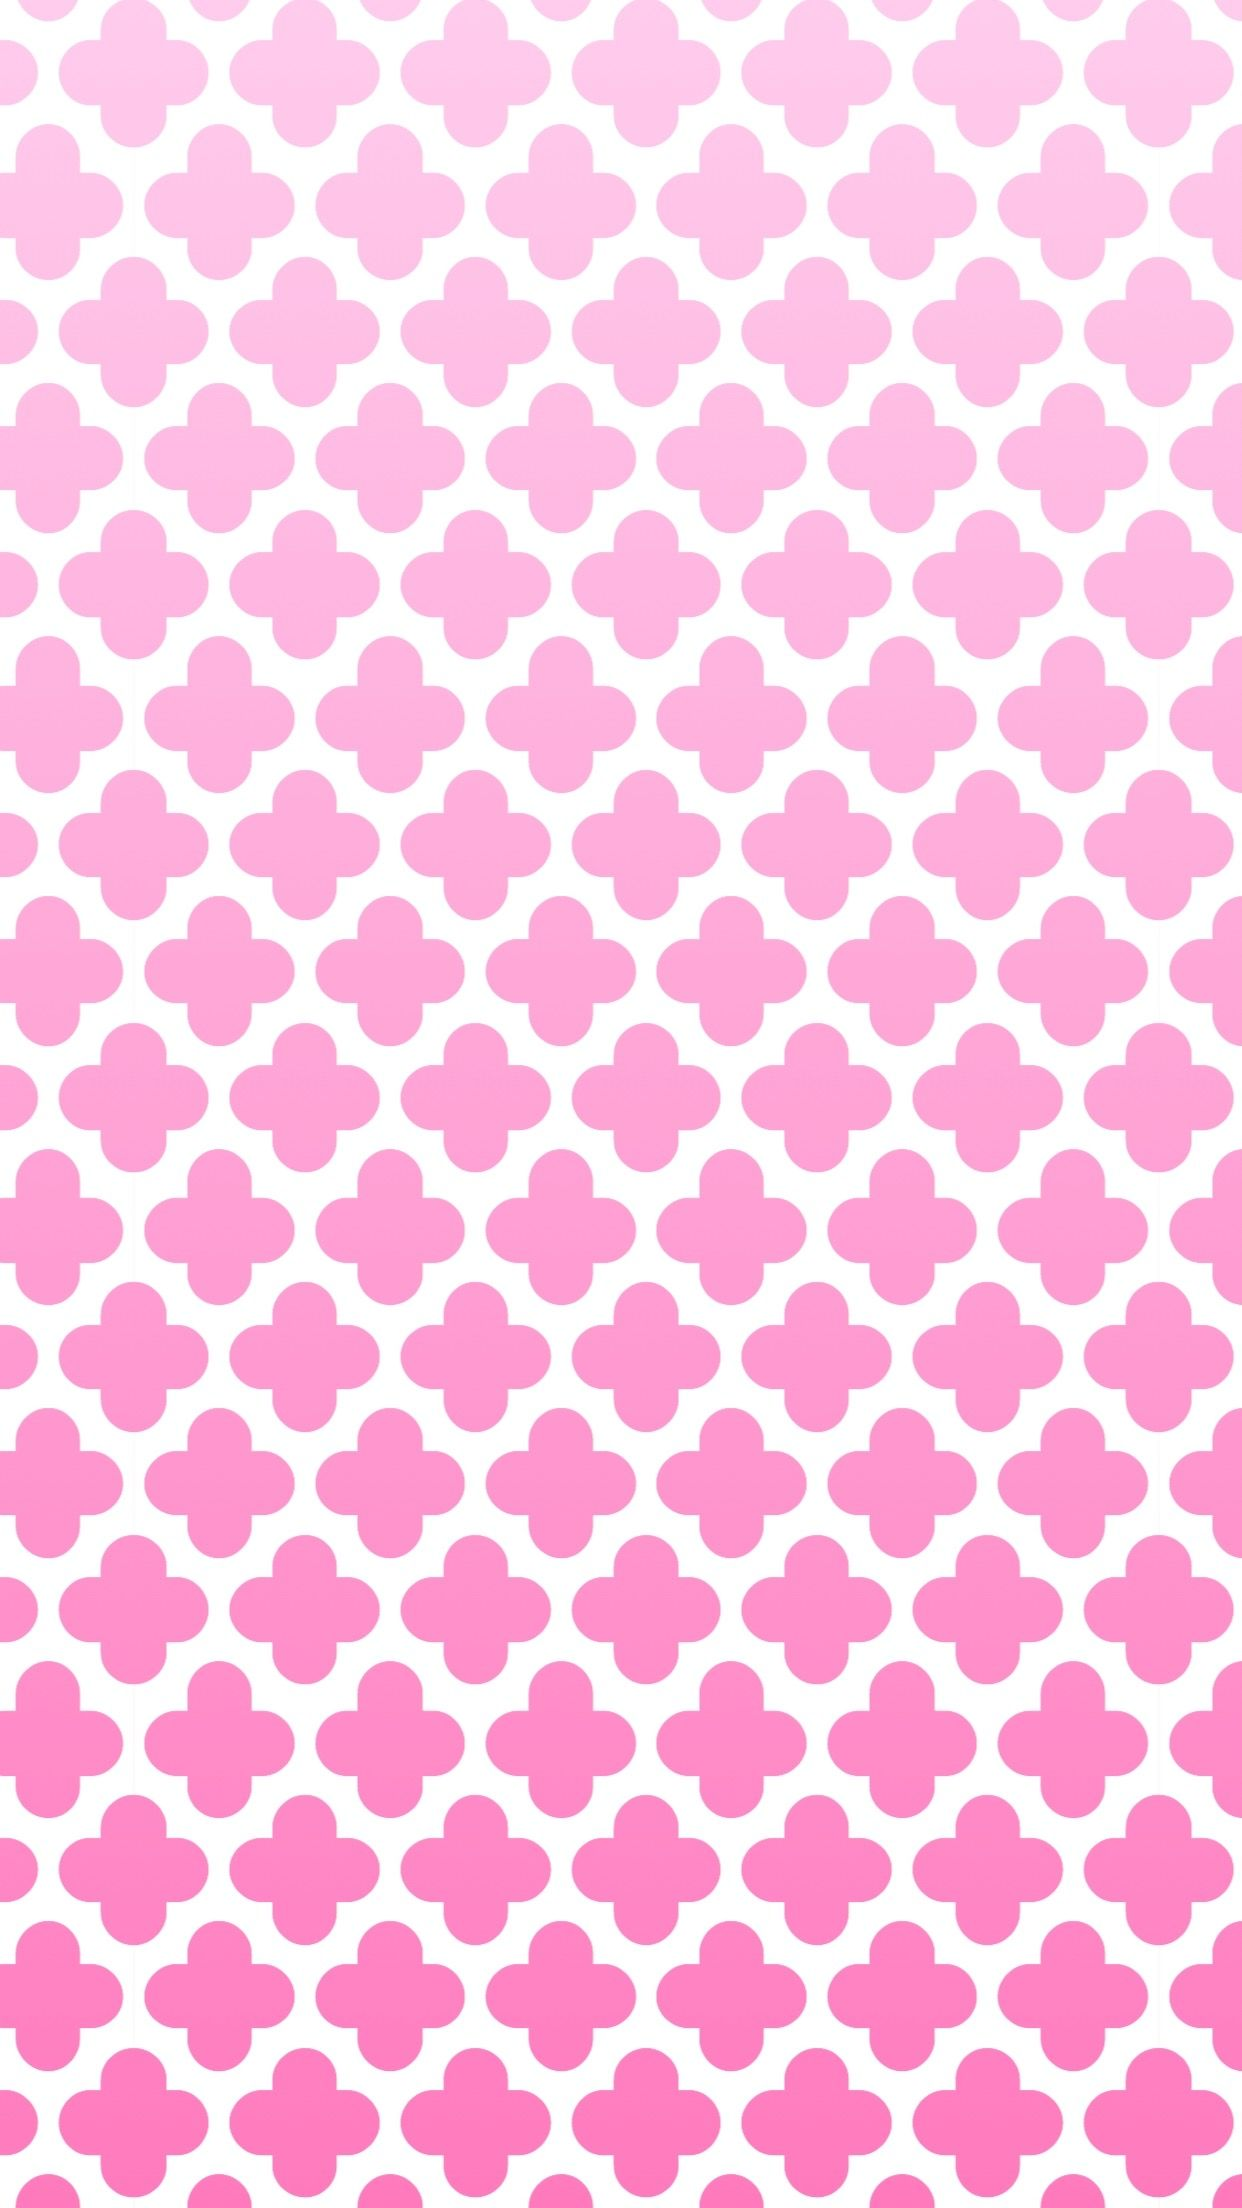 iPhone wallpaper cute pink girly quatrefoil   Iphone ...